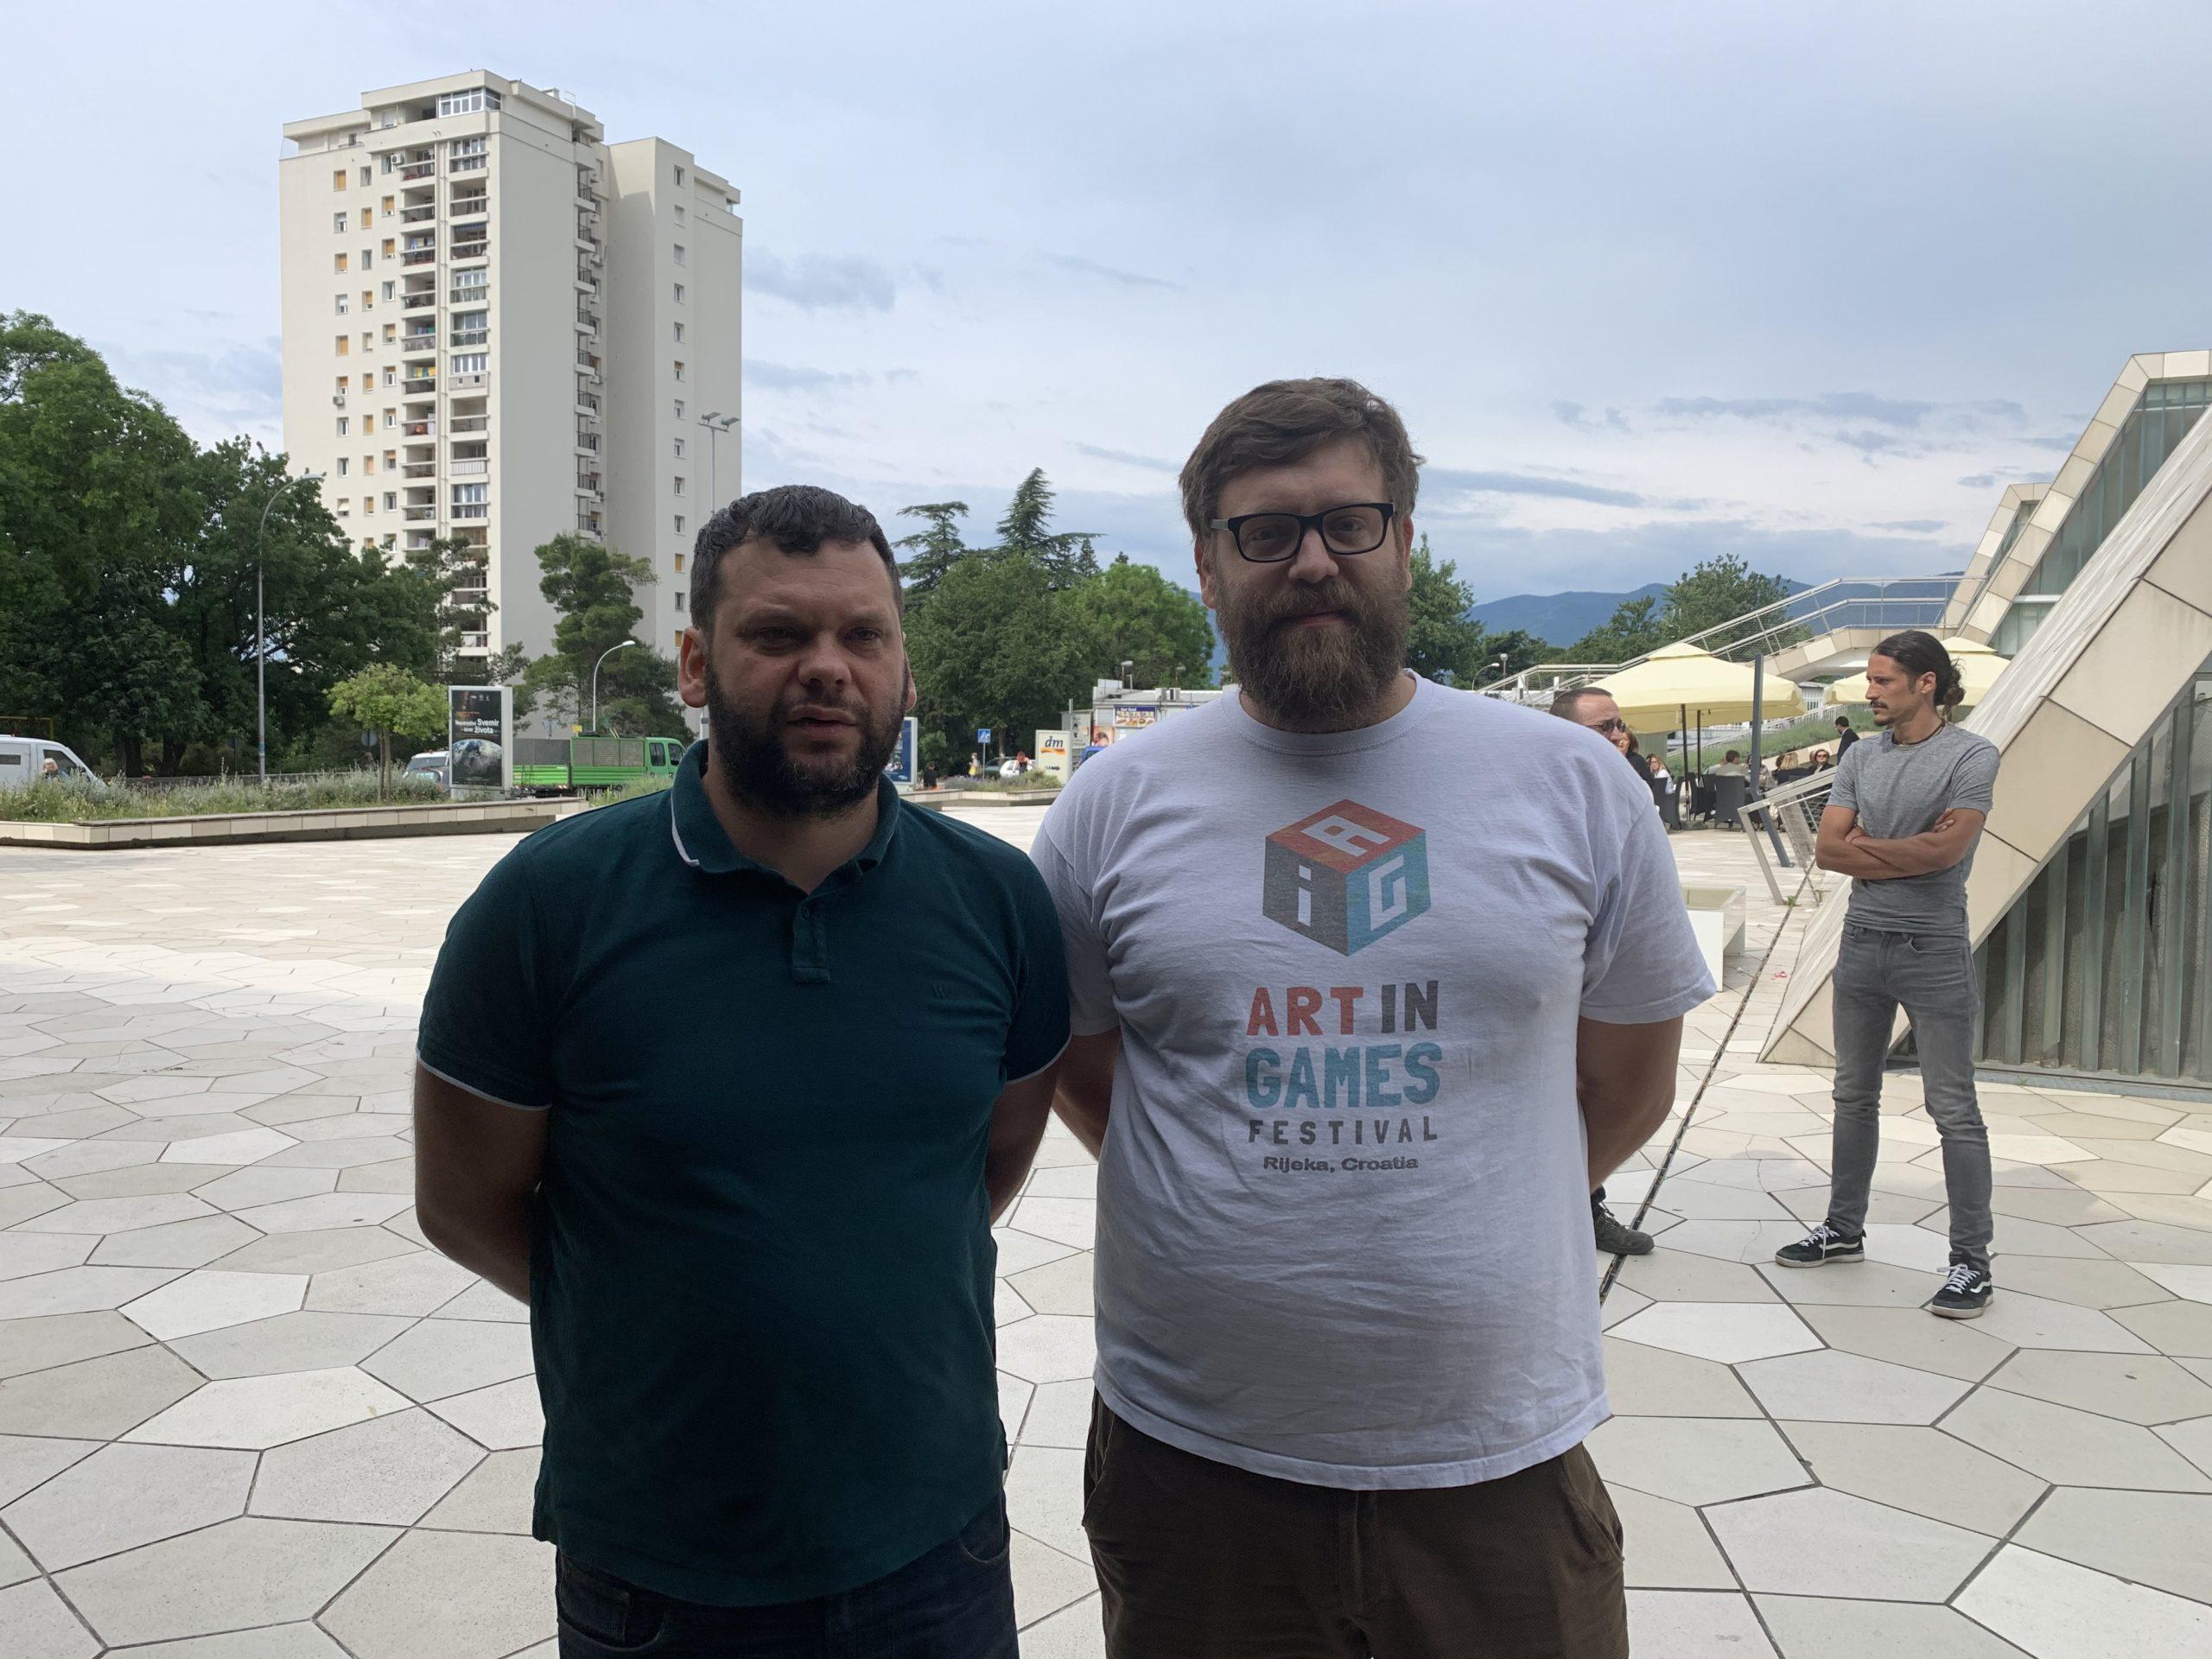 Akcija mladih, Bojan Kurelić i Vedran Vivoda / Foto: B. ČALUŠIĆ